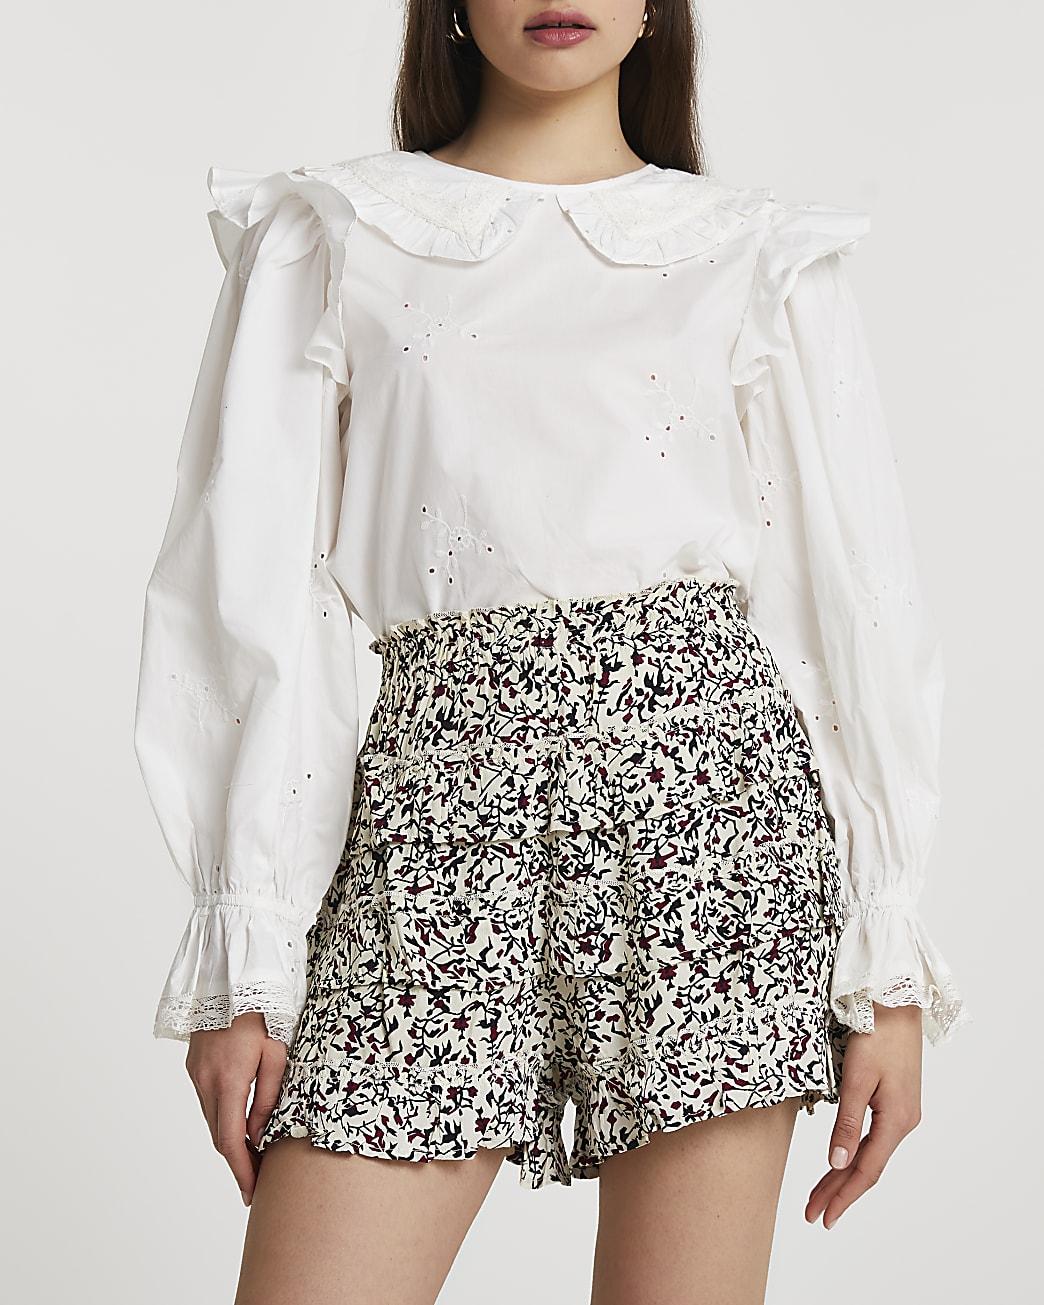 Black frill tiered shorts